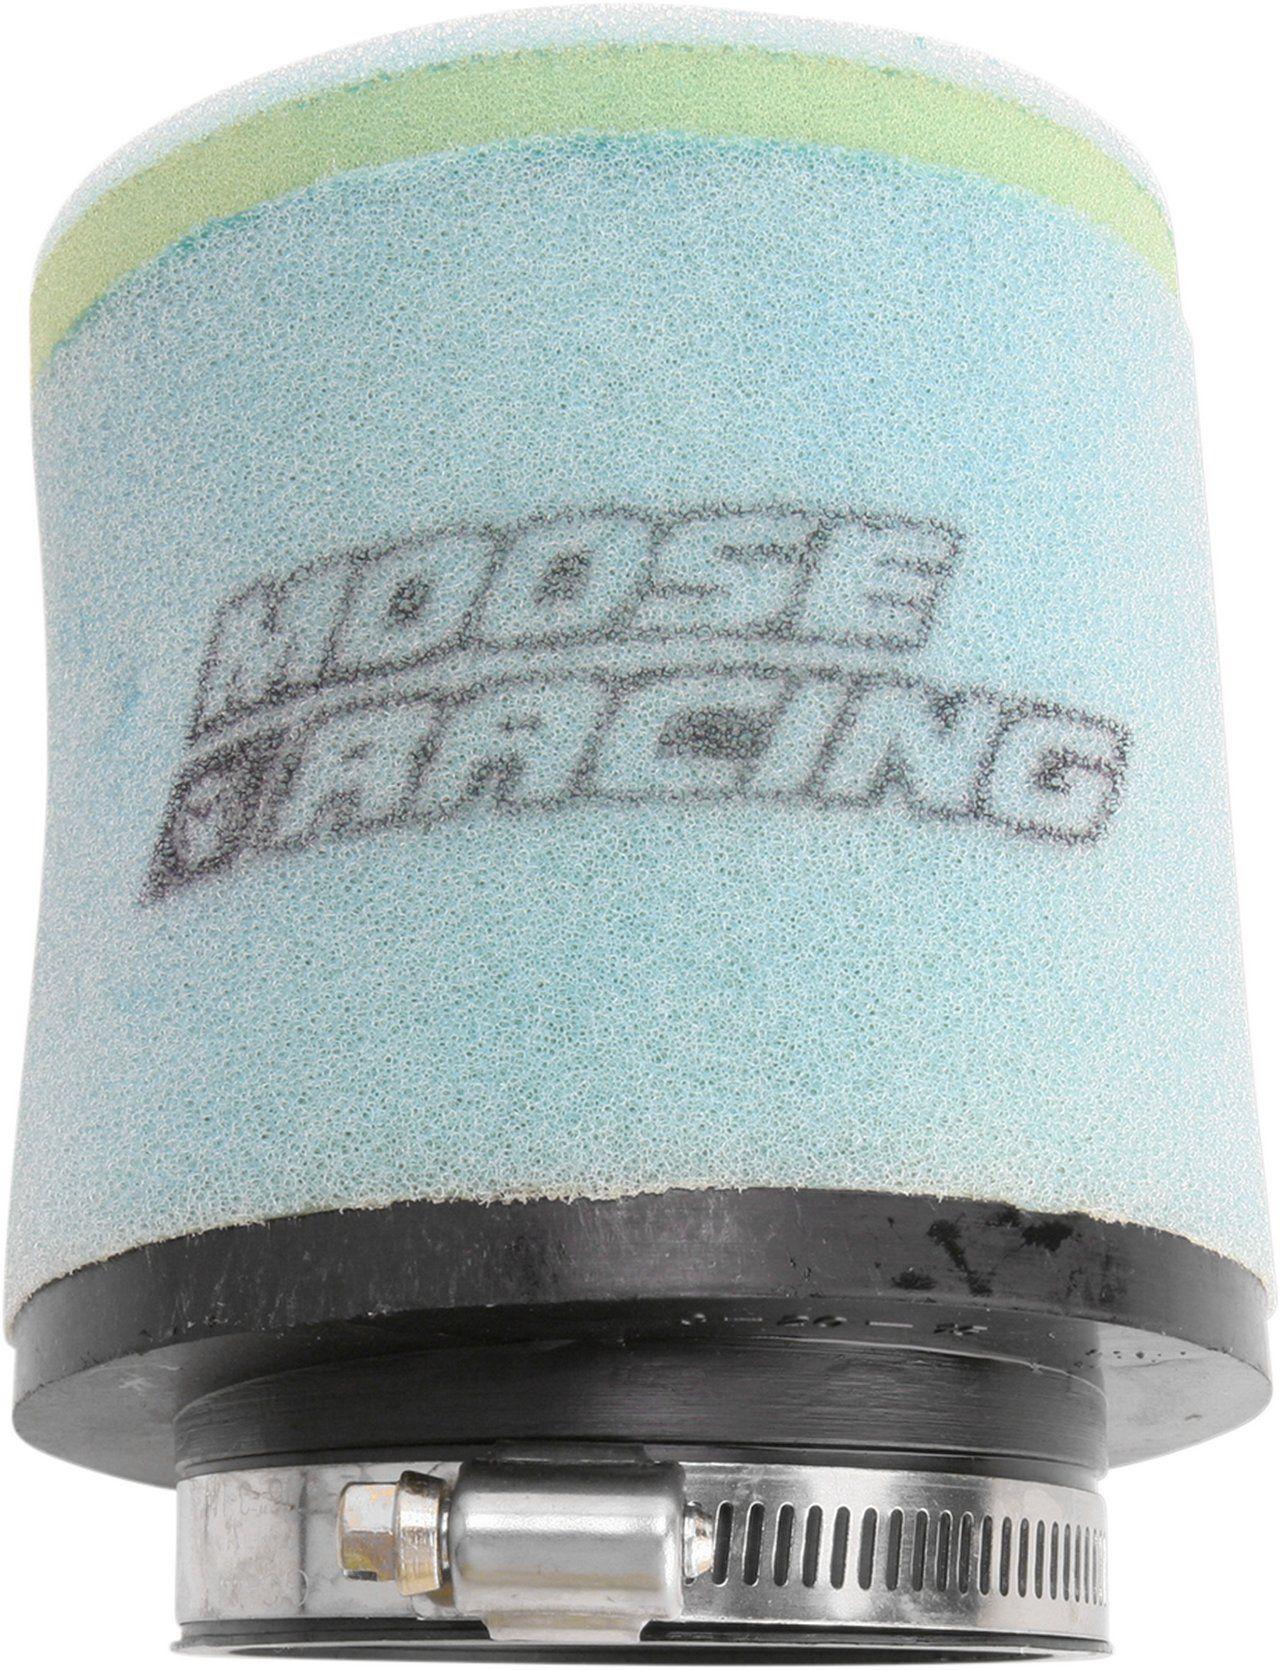 【MOOSE RACING】PPO (PRECISION PRE-OILED) 空氣濾芯 [1011-2545] - 「Webike-摩托百貨」